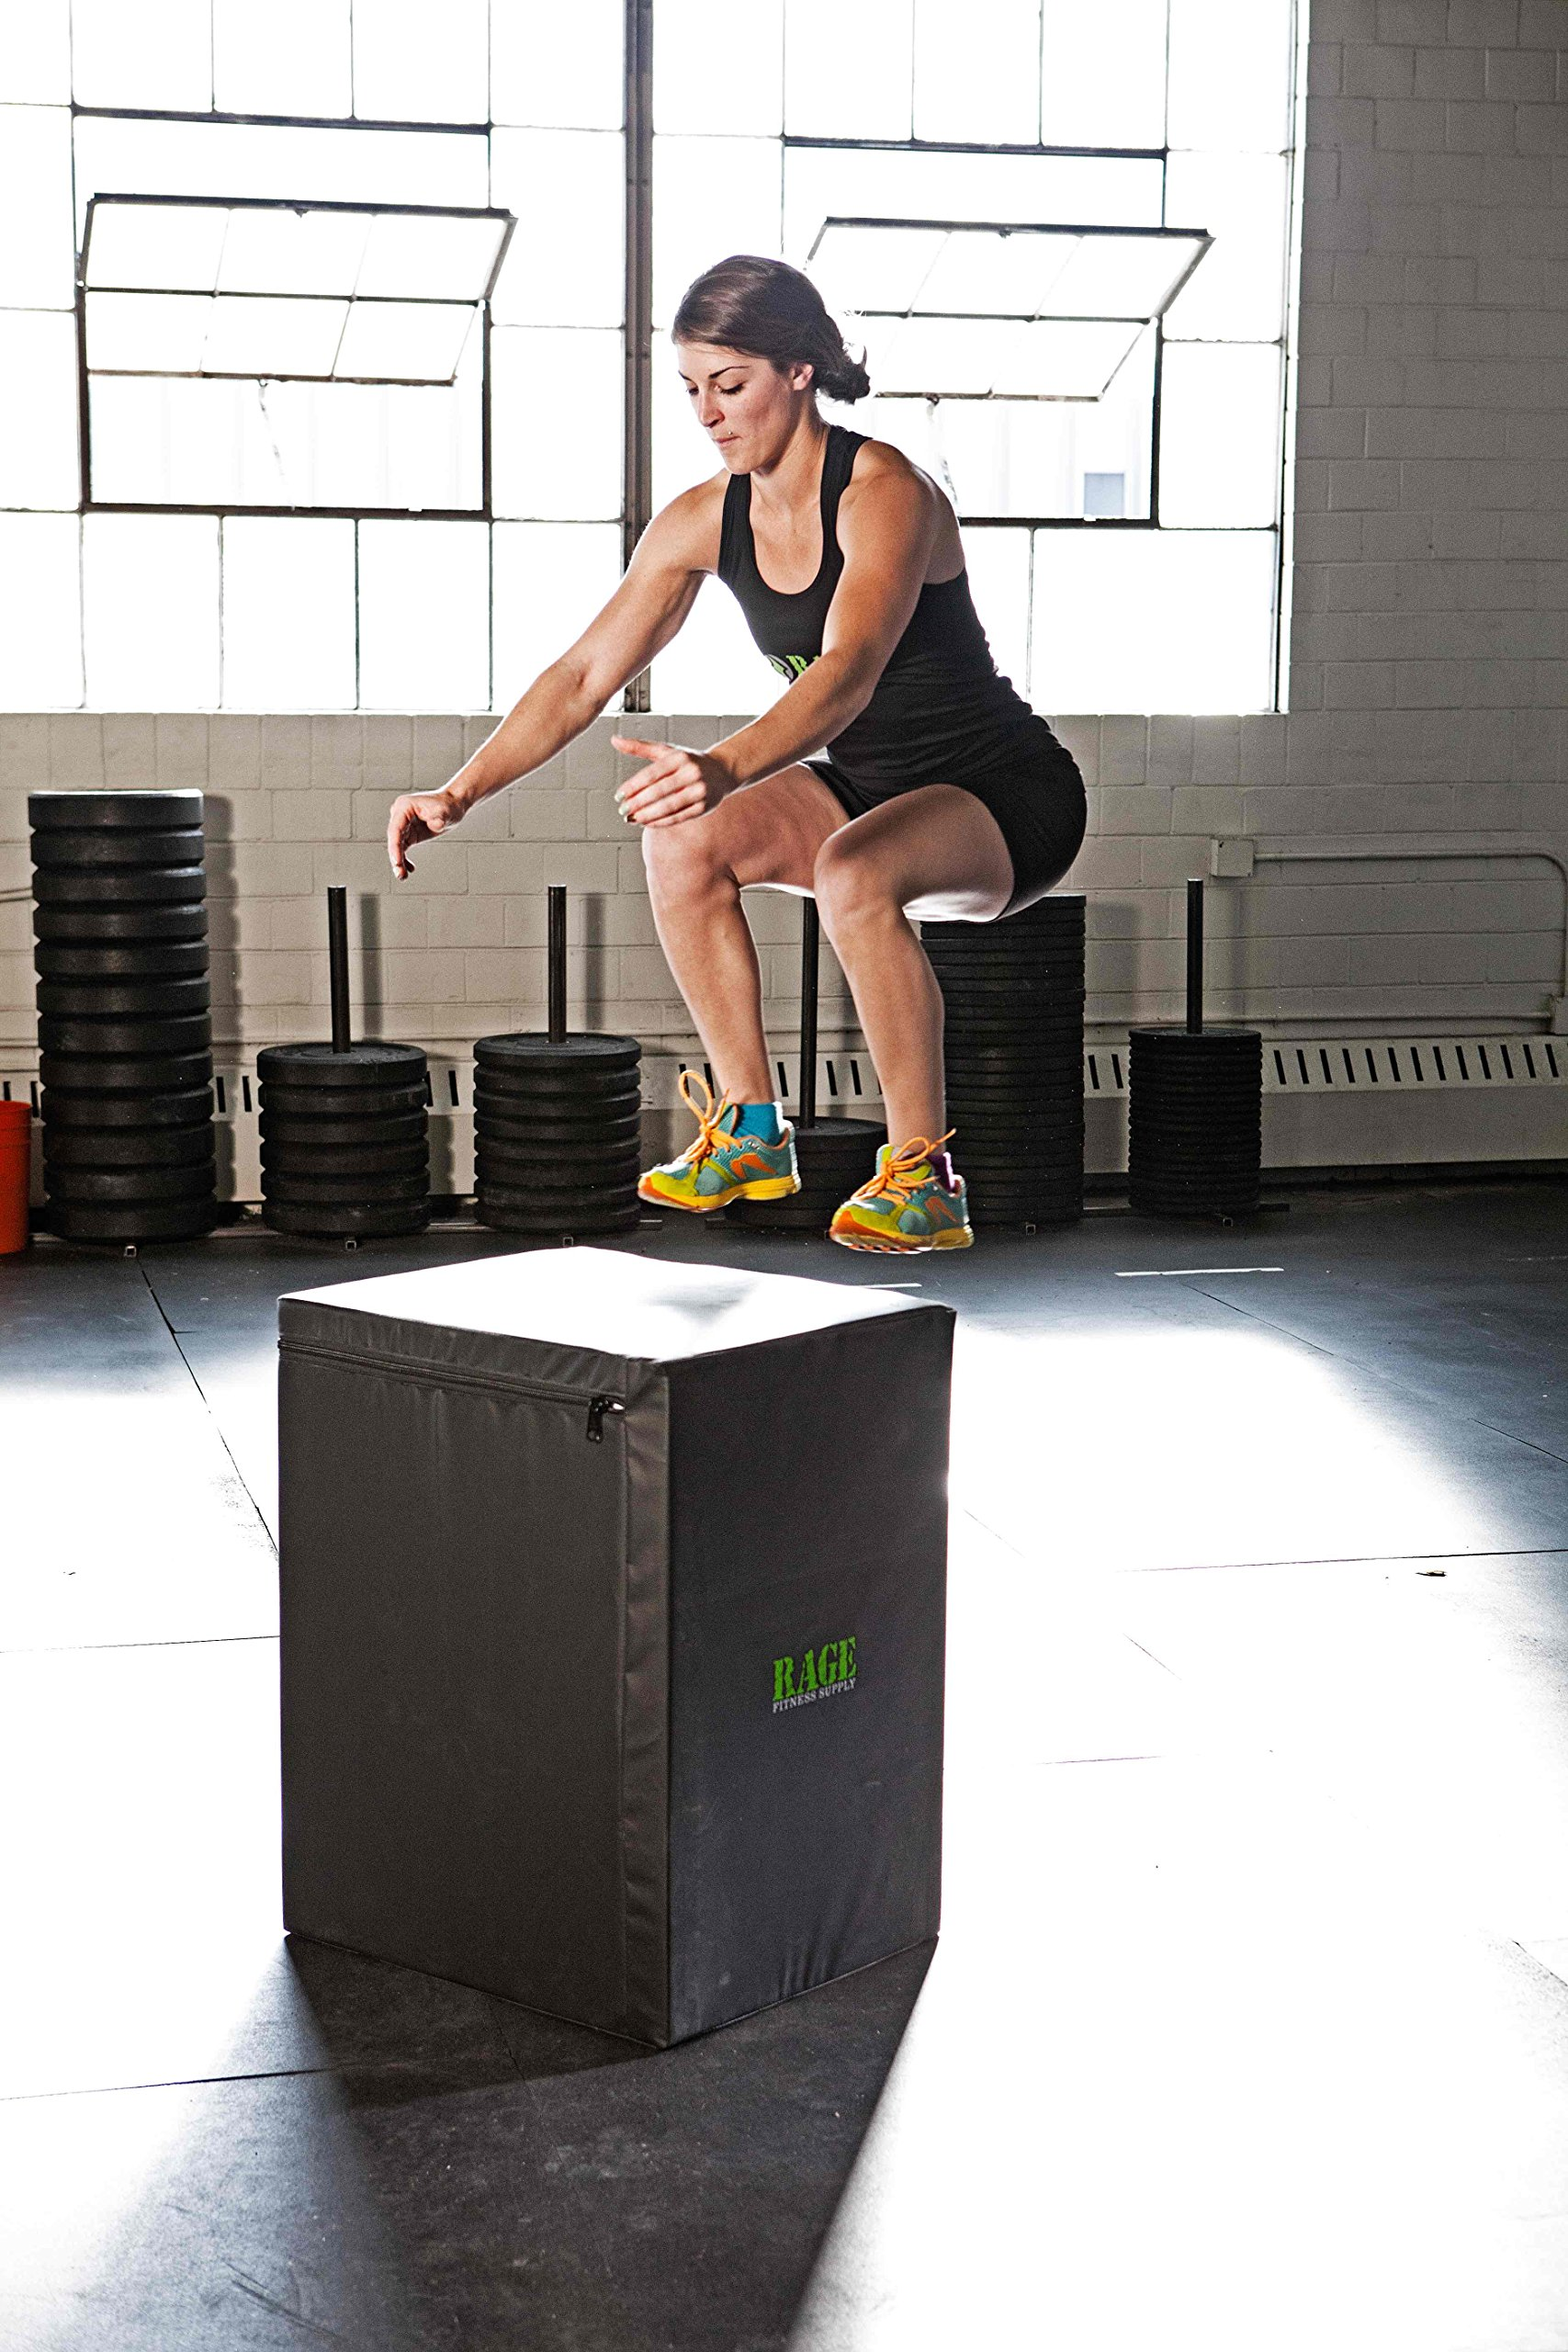 Rage Fitness 3 in 1 Soft Cube Plyometric Jump Box